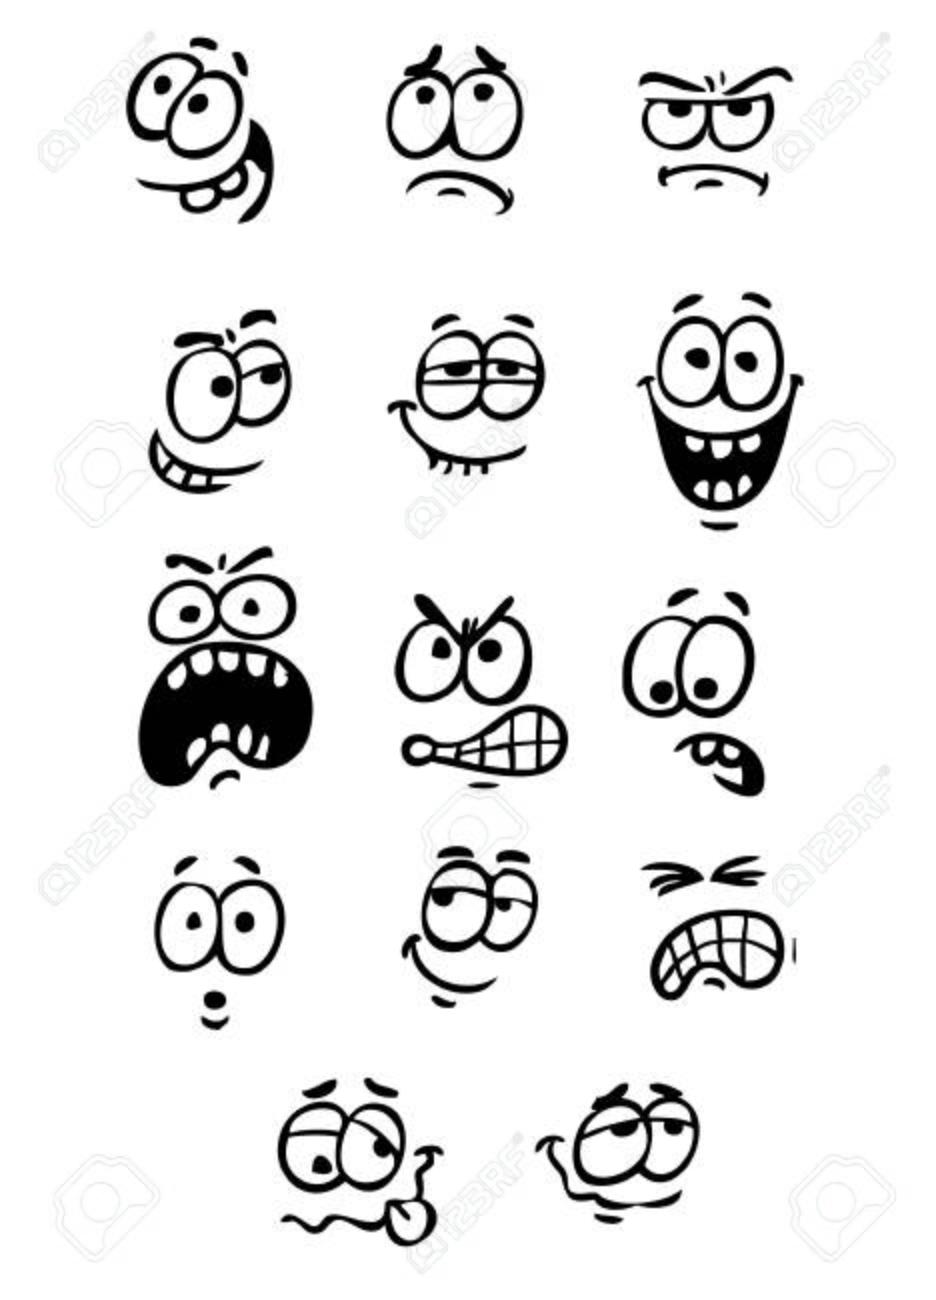 Cartoon Eyes Emoticons Symbols Royalty Free Cliparts Vectors And